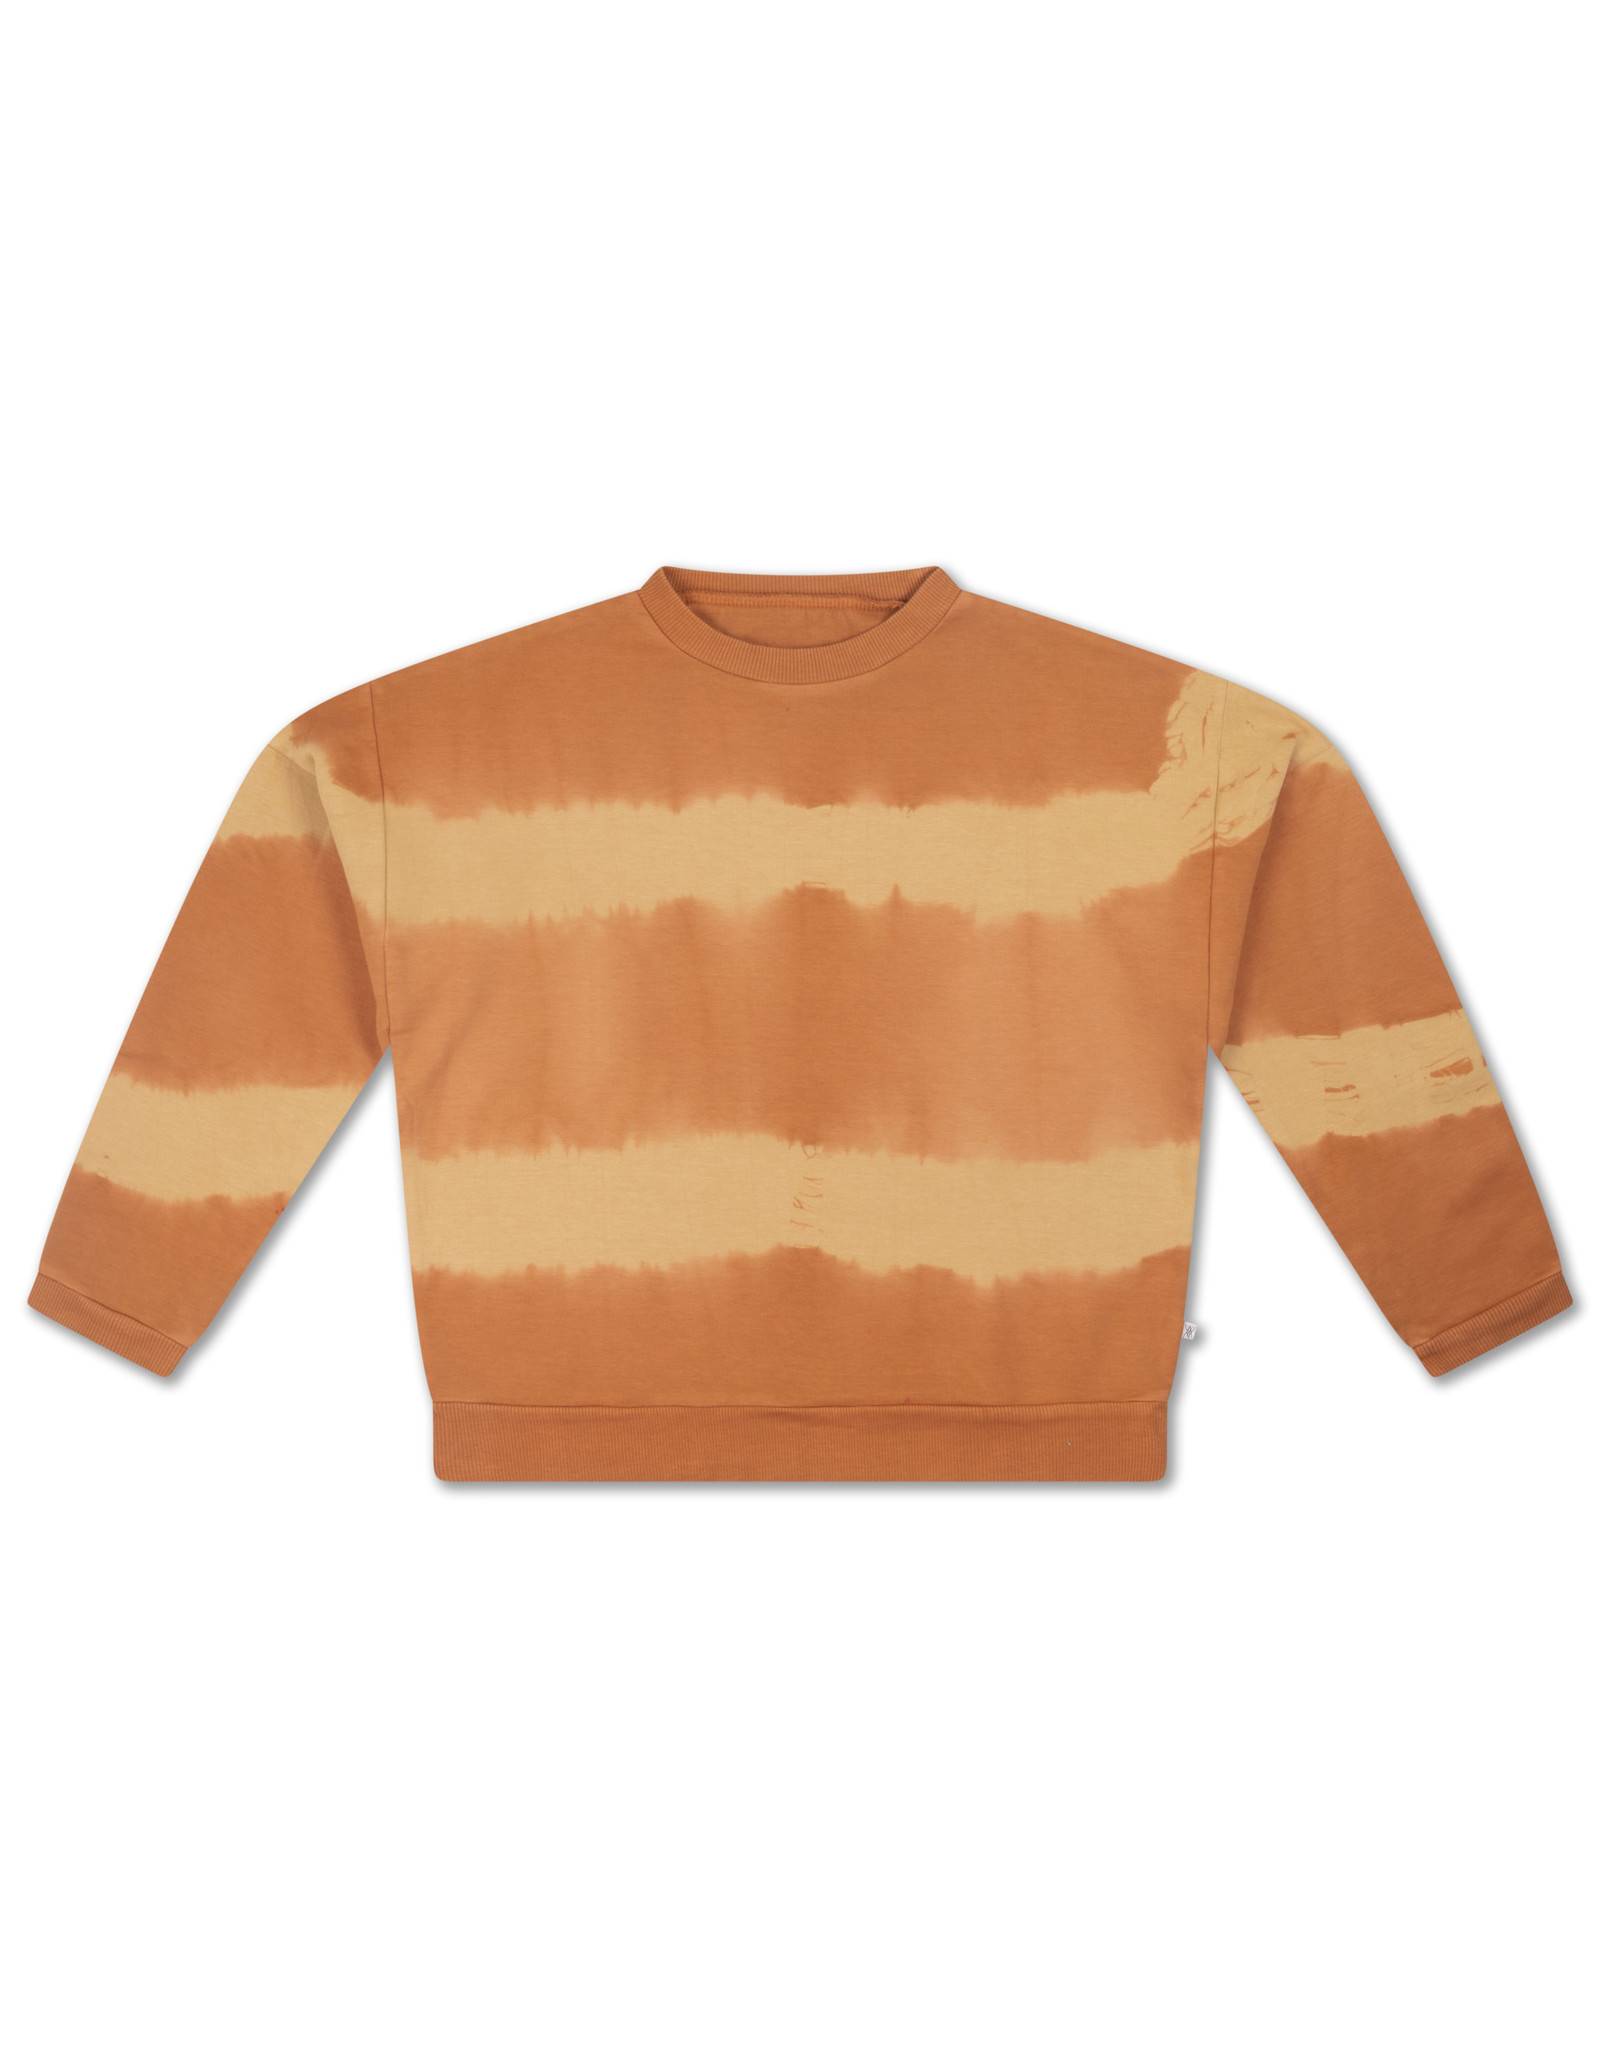 Repose Repose SS21 20 Sweater fudge marble